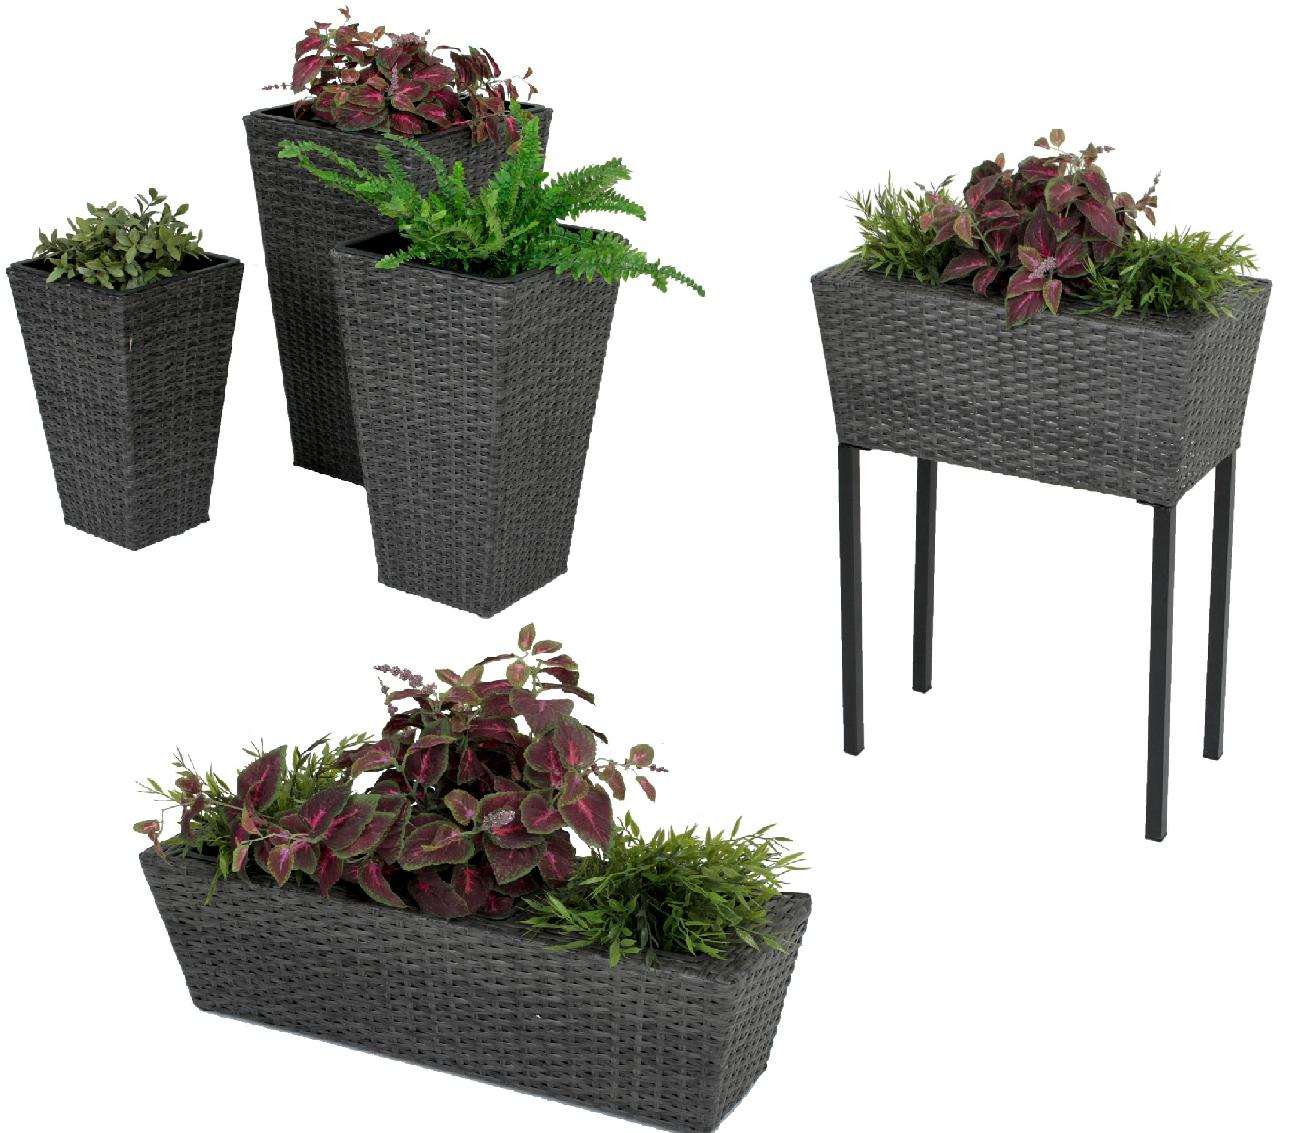 hochbeet pflanztopf balkonk sten rattan blumentopf. Black Bedroom Furniture Sets. Home Design Ideas